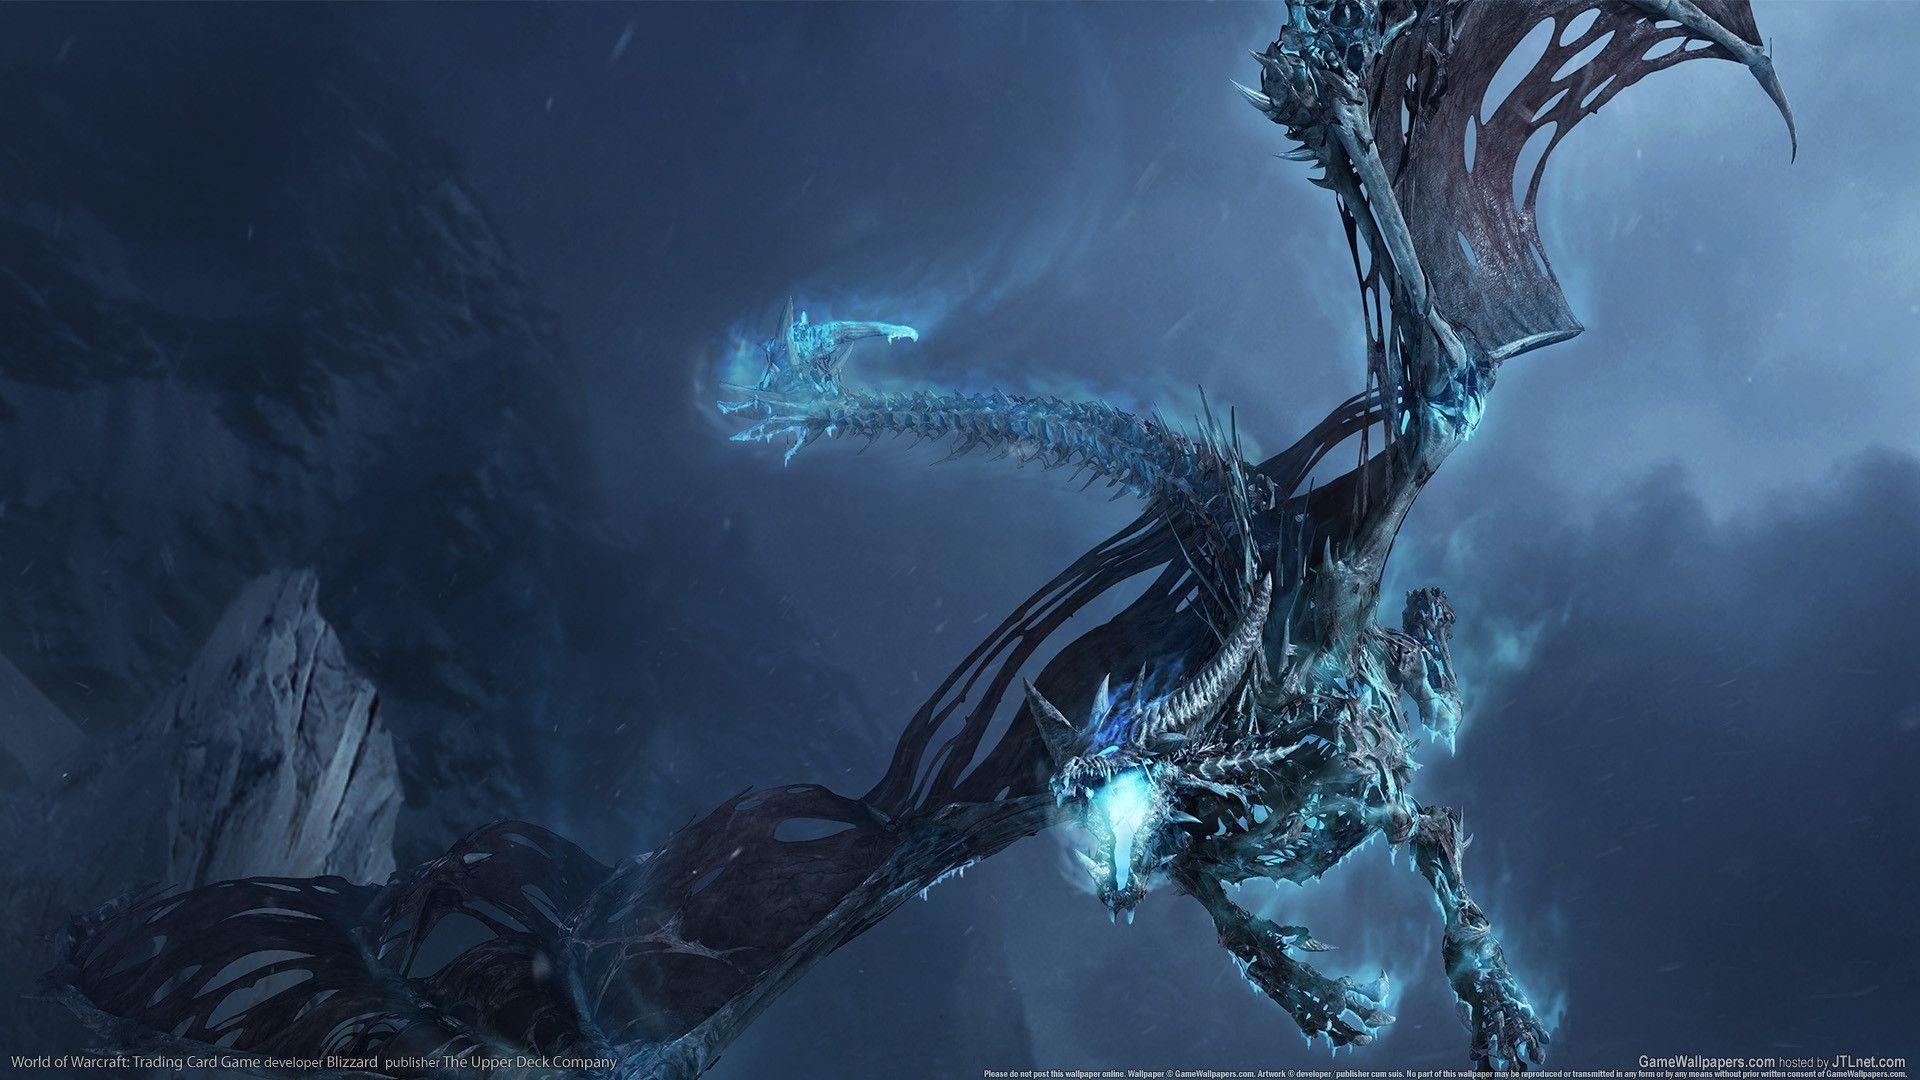 World Of Warcraft HD Wallpaper 1920×1080